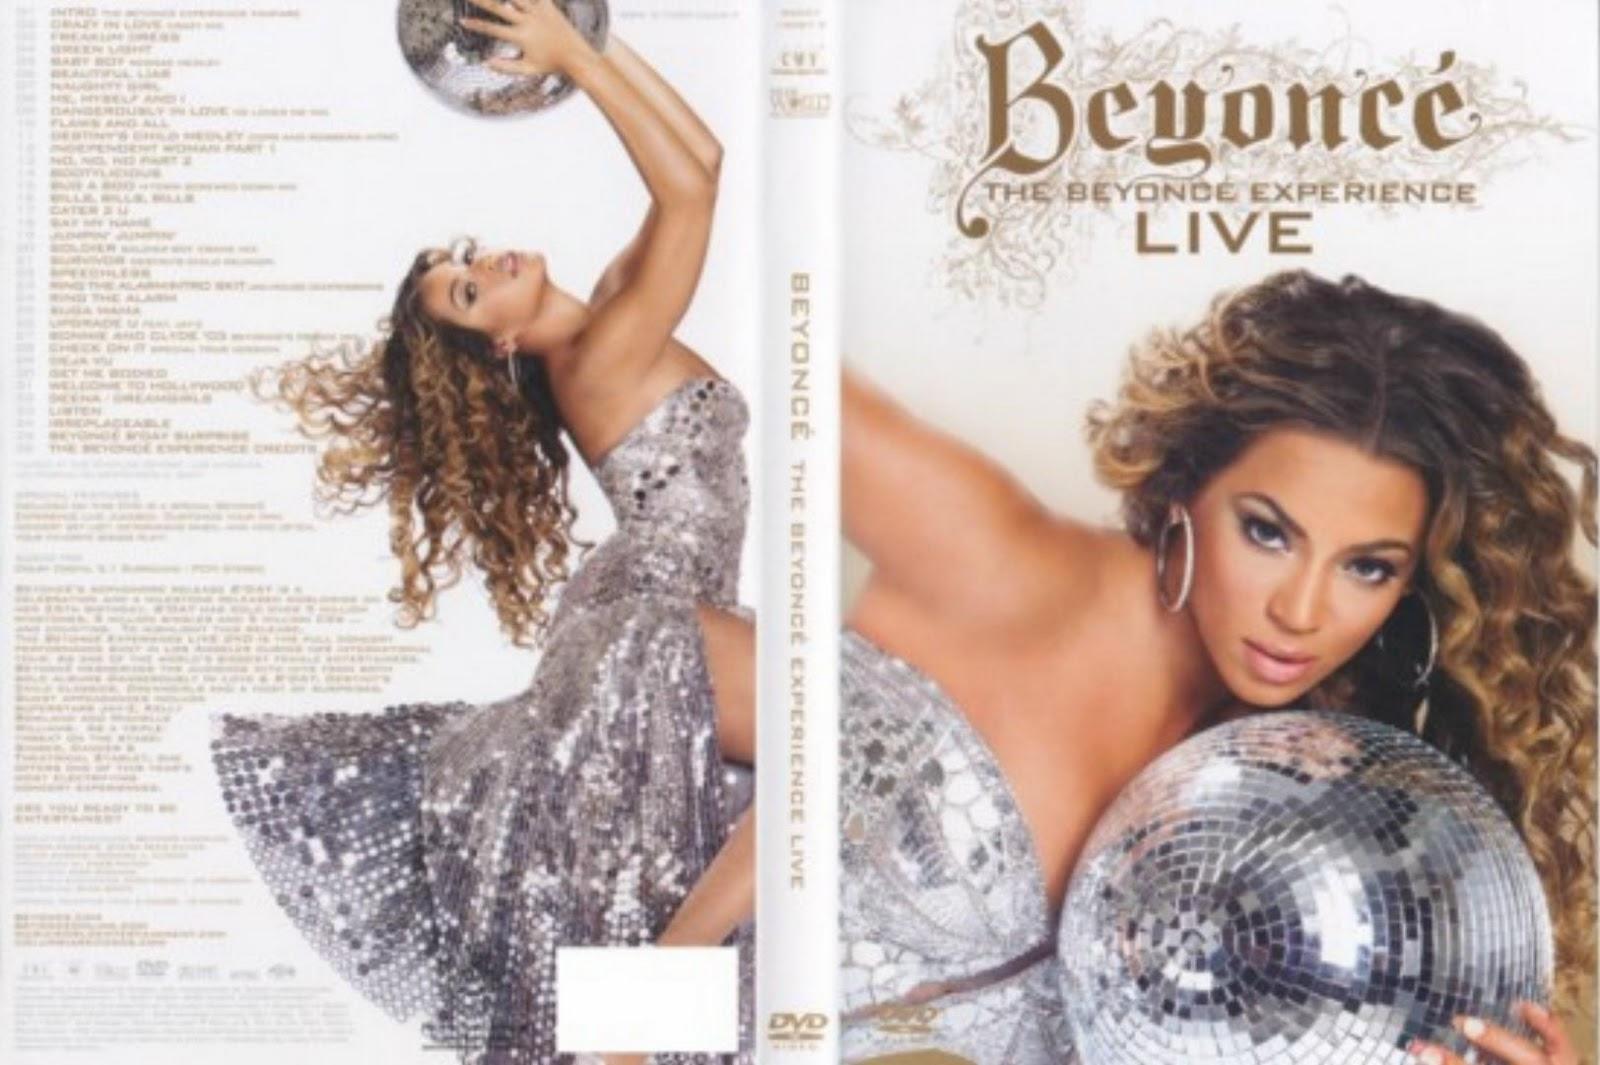 http://2.bp.blogspot.com/_dpj8cXZxGgs/TMNA9SrhBfI/AAAAAAAAAJc/YkTE5ek-cp0/s1600/beyonce+the+beyonce+experience+live.JPG